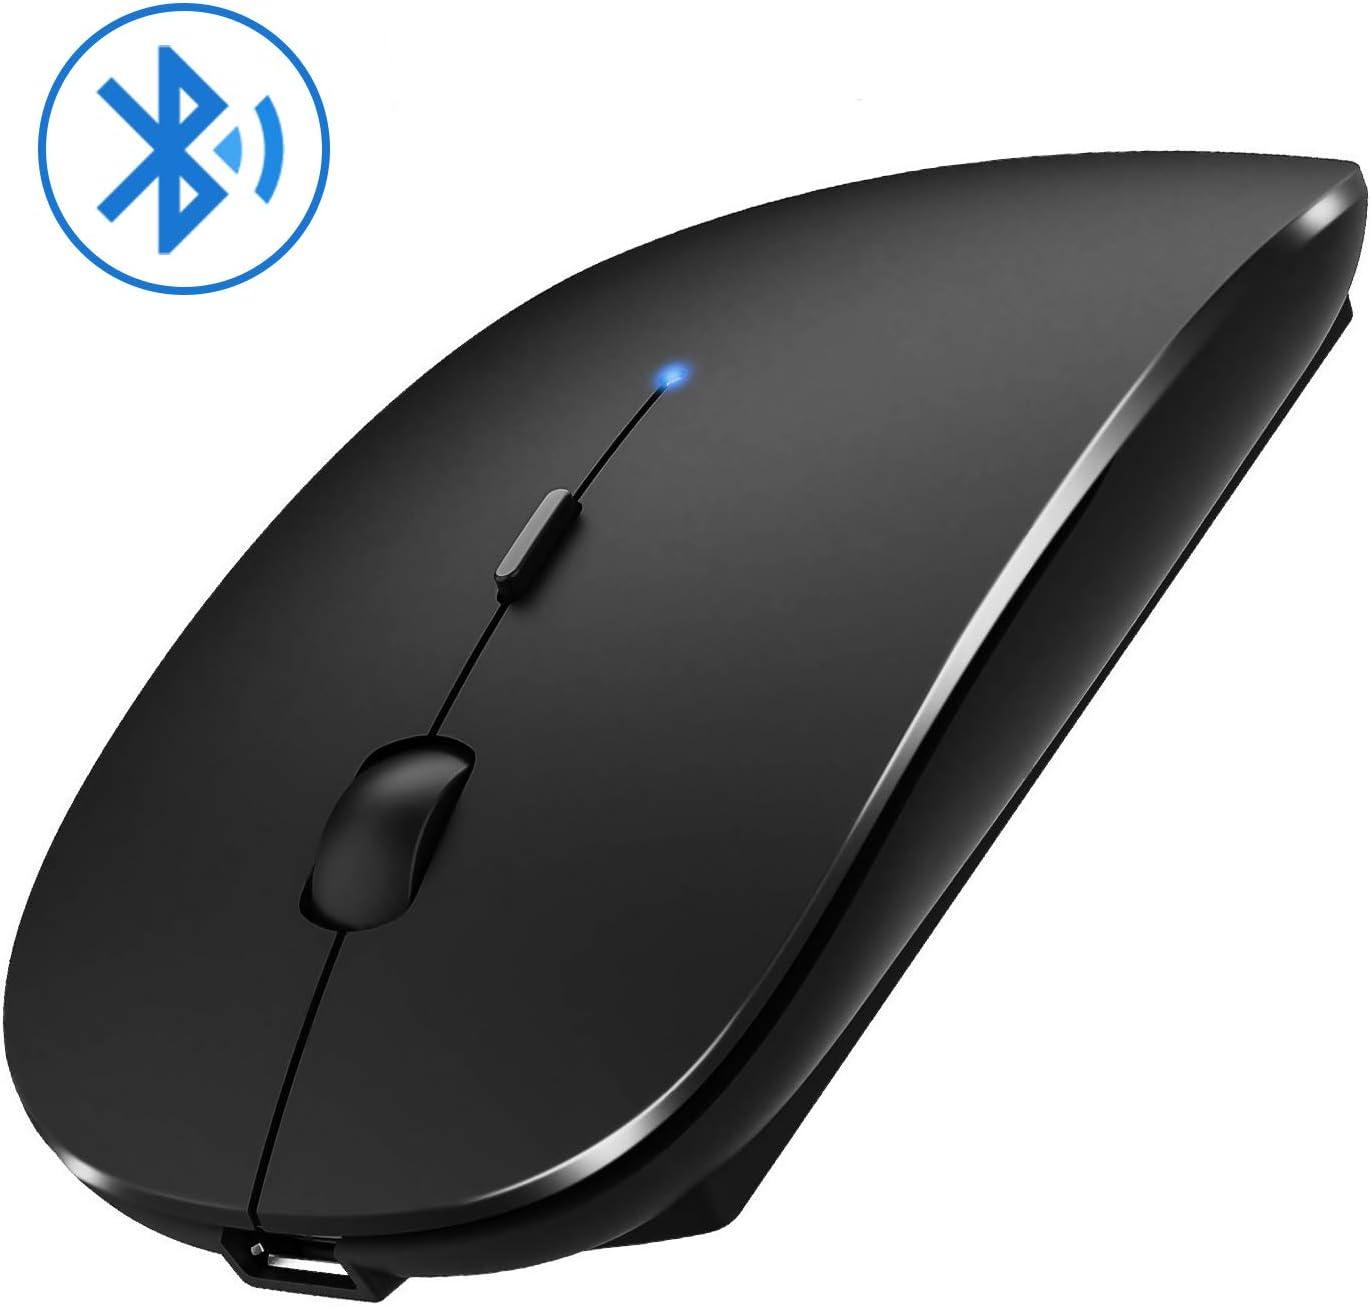 Jaybest Ratón Bluetooth, Ratón Bluetooth sin Receptor 3.0 Mini Ratón para Juegos para Computadora Portátil, PC, Computadora Portátil, Computadora con Sistema Operativo Windows/Android(Gris Negro)